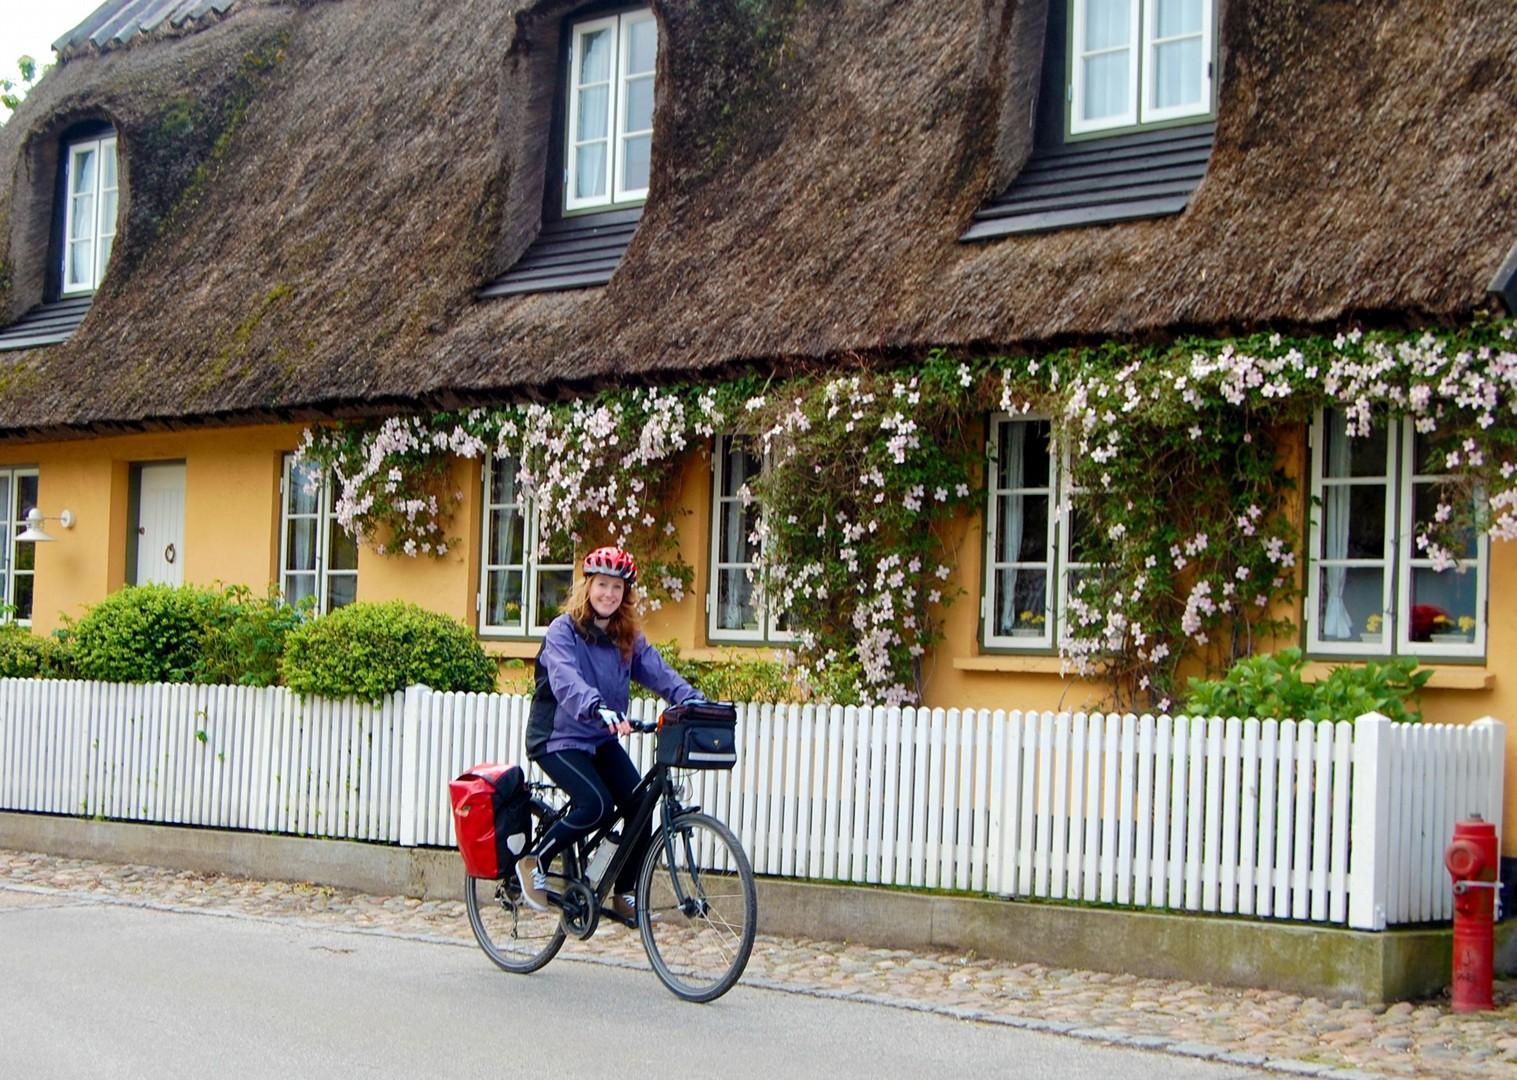 traditional-danish-houses-denmark-leisure-holiday.jpg - NEW! Denmark - Coast, Castles and Copenhagen - Leisure Cycling